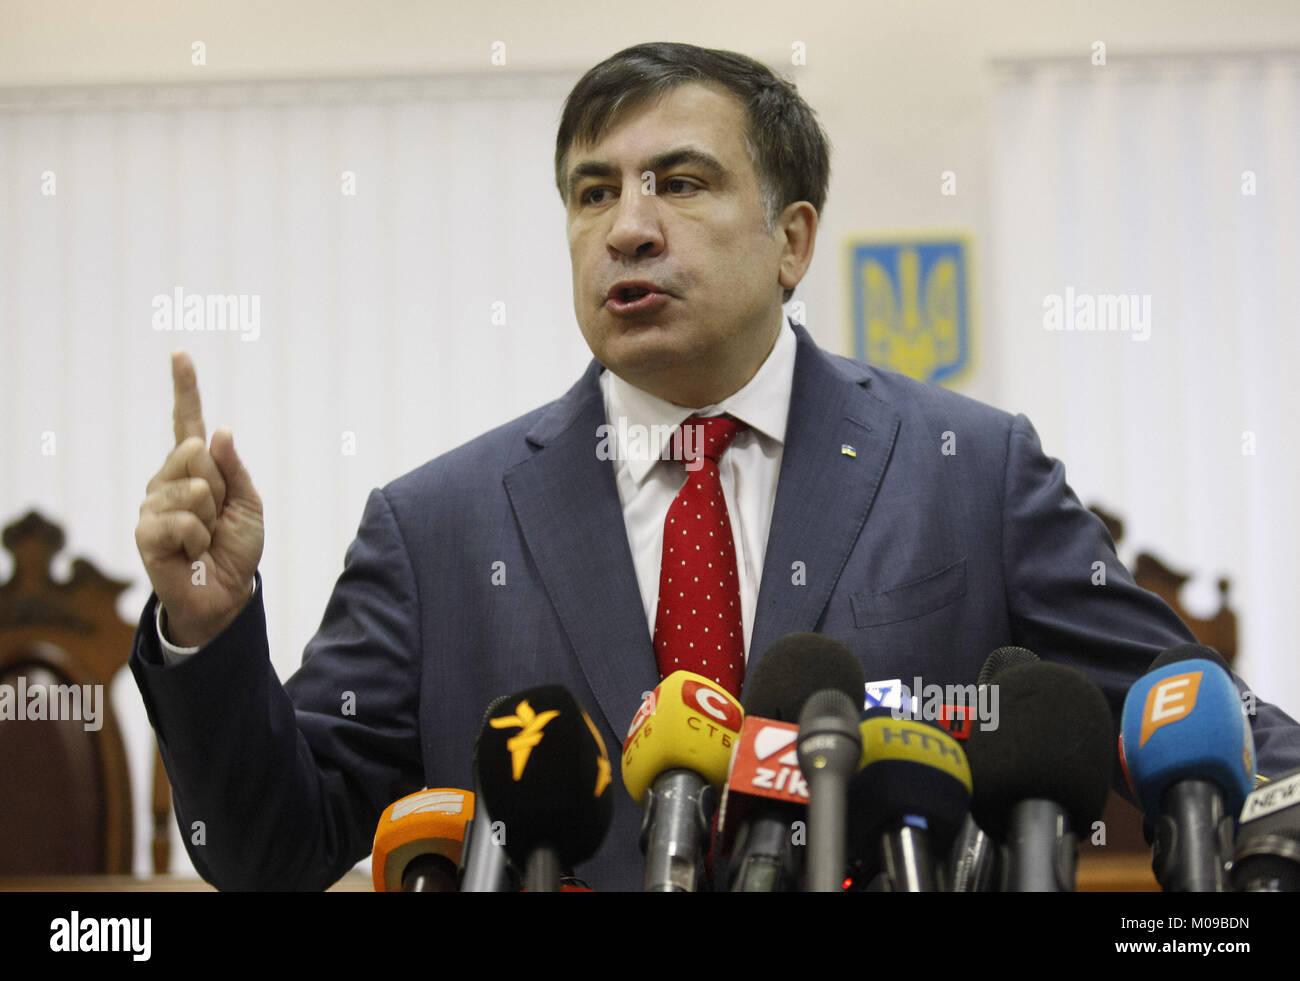 Kiev, Ukraine. 19th Jan, 2018. Former Georgian president and ex-Odessa Governor MIKHEIL SAAKASHVILI speaks during - Stock Image